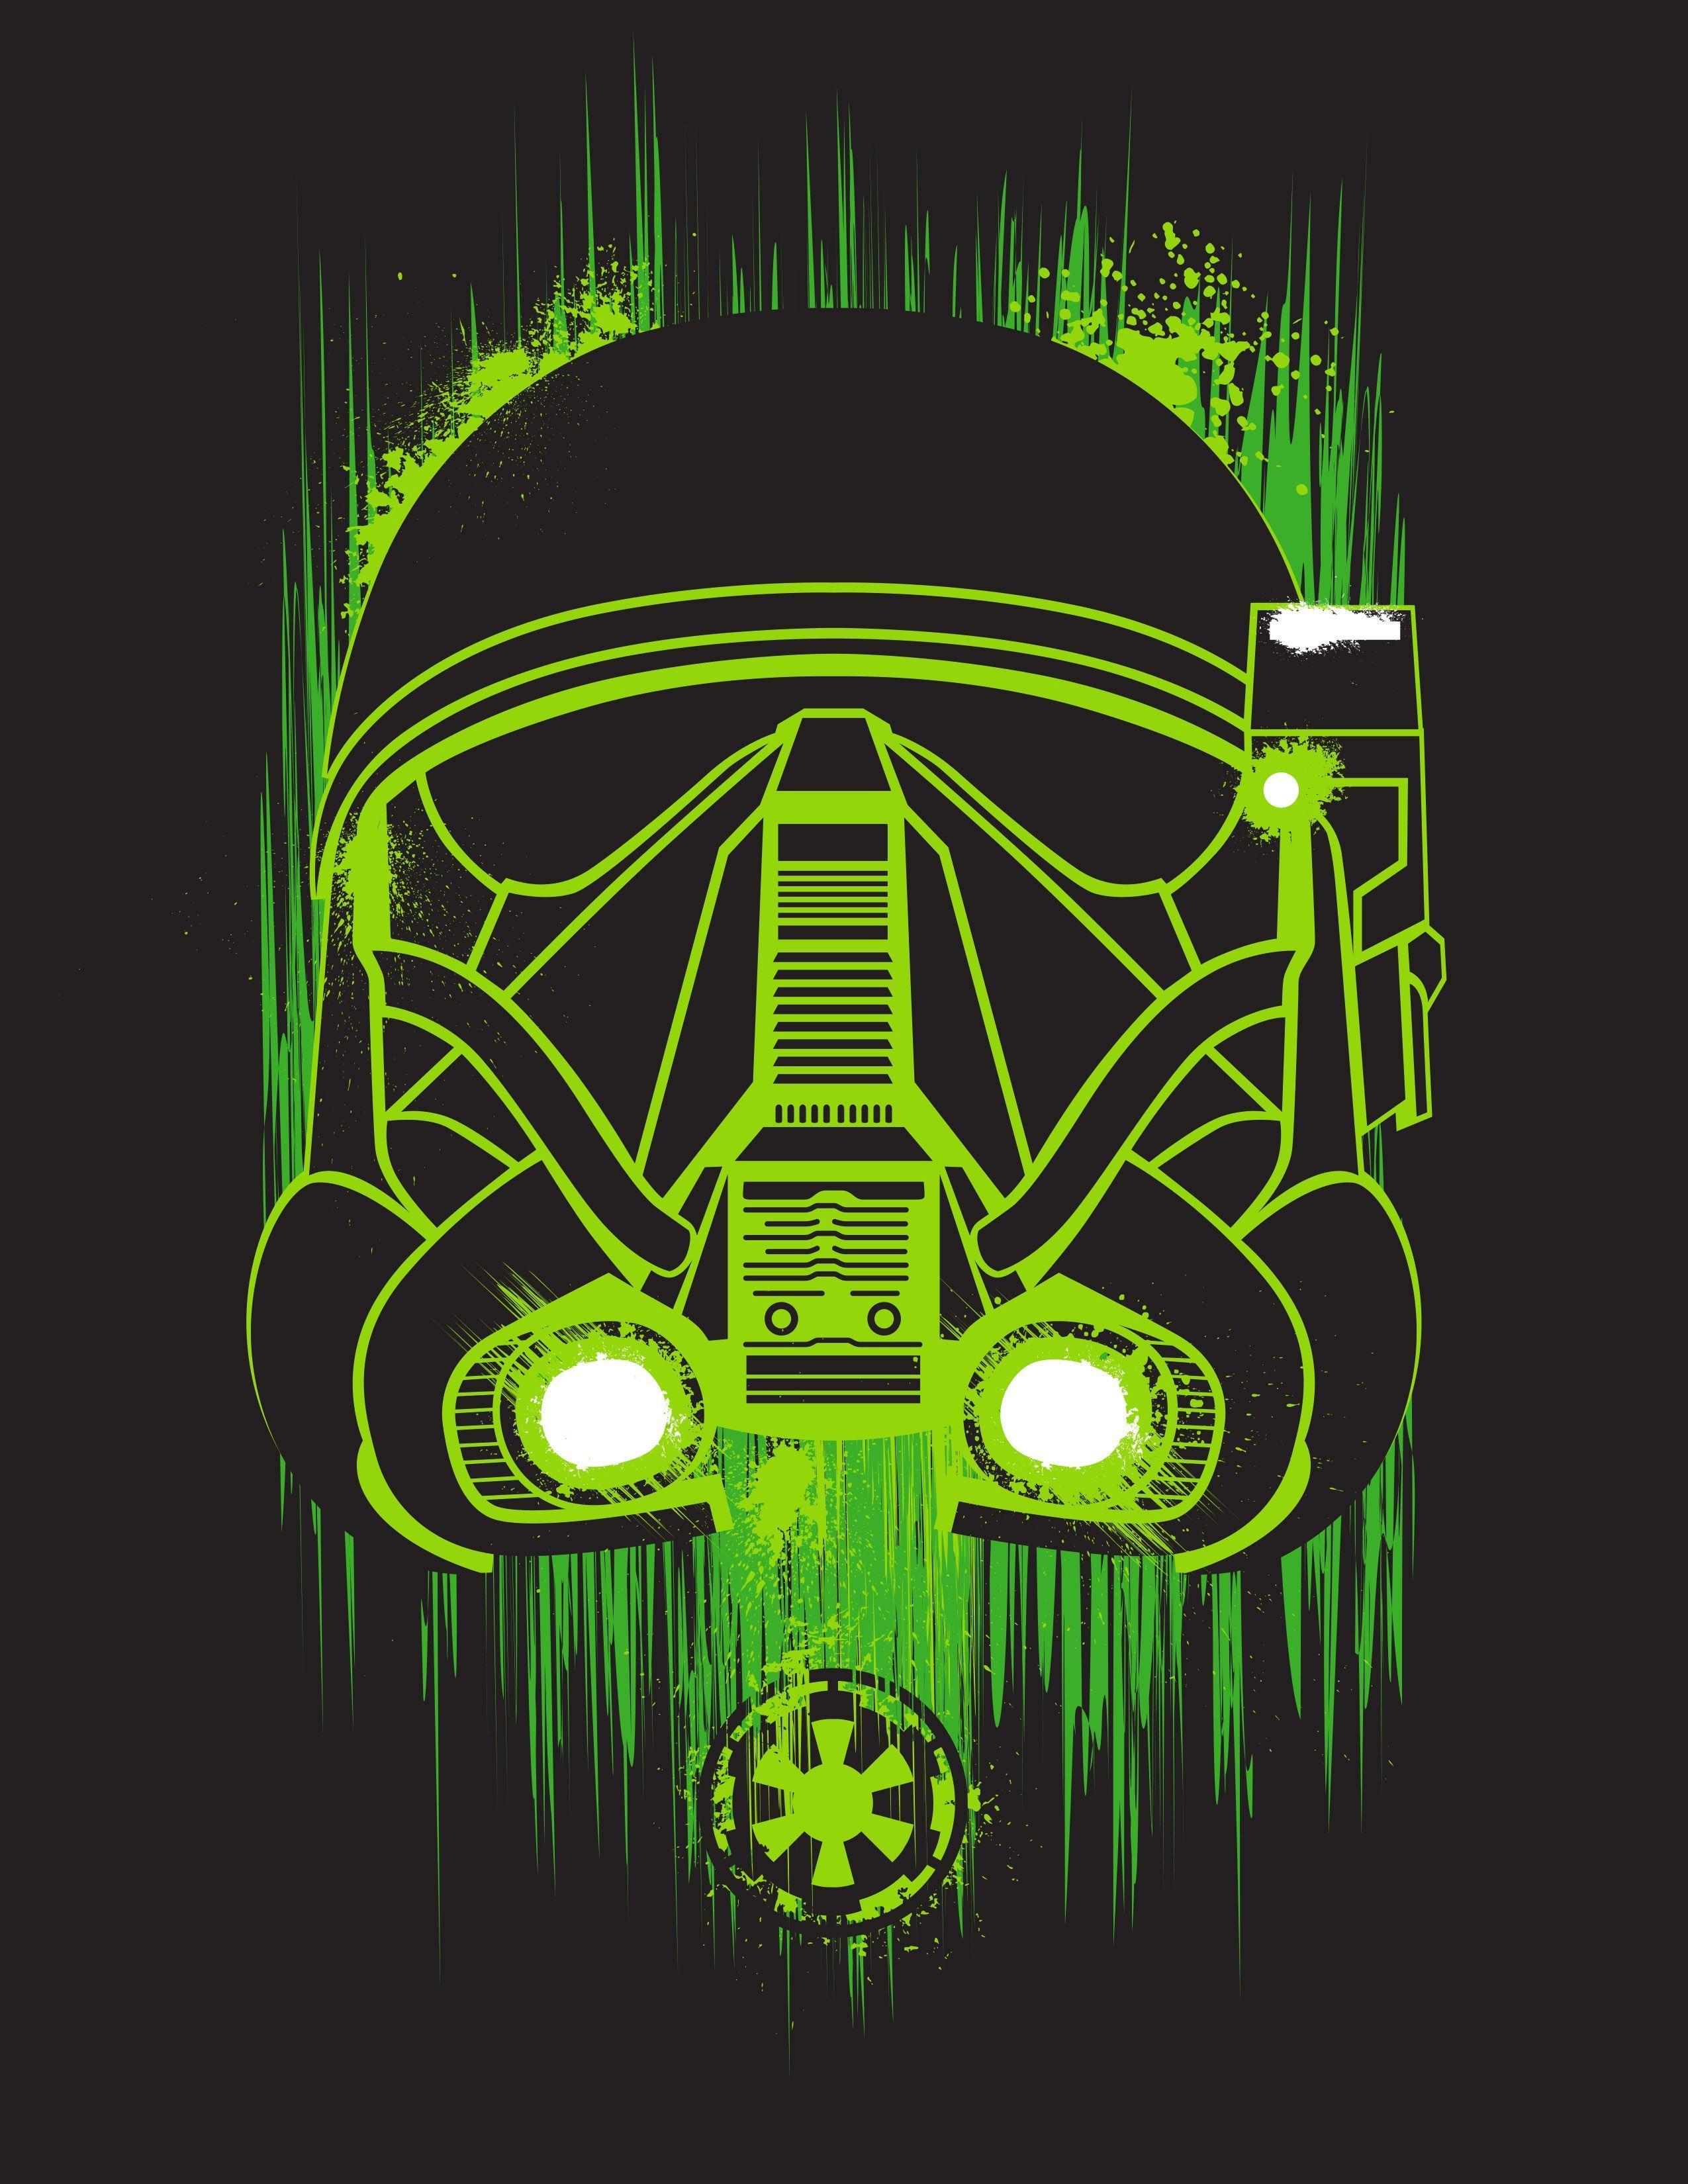 Star Wars Wallpaper Neon